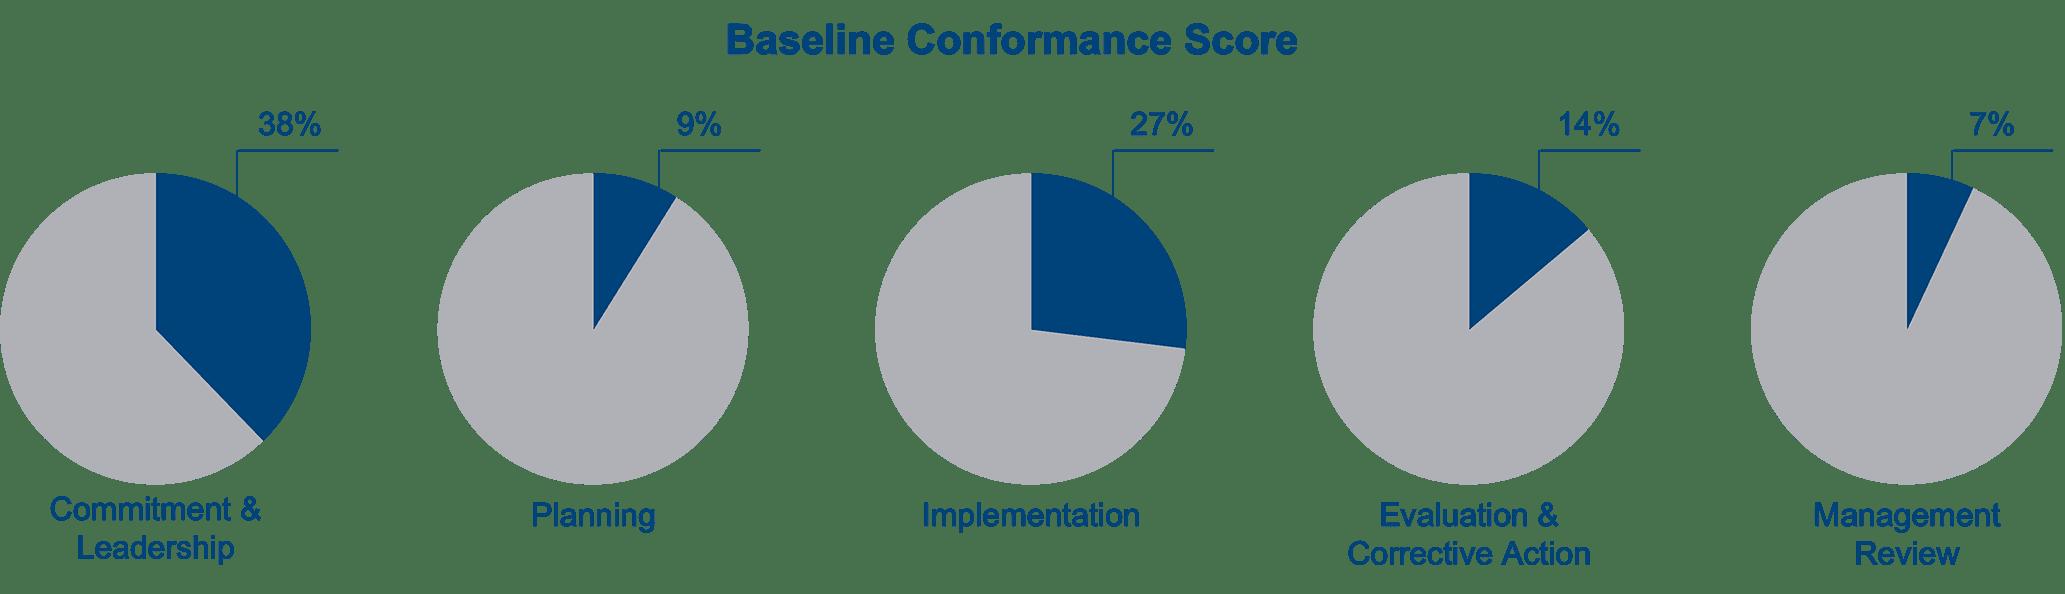 Baseline conformance score